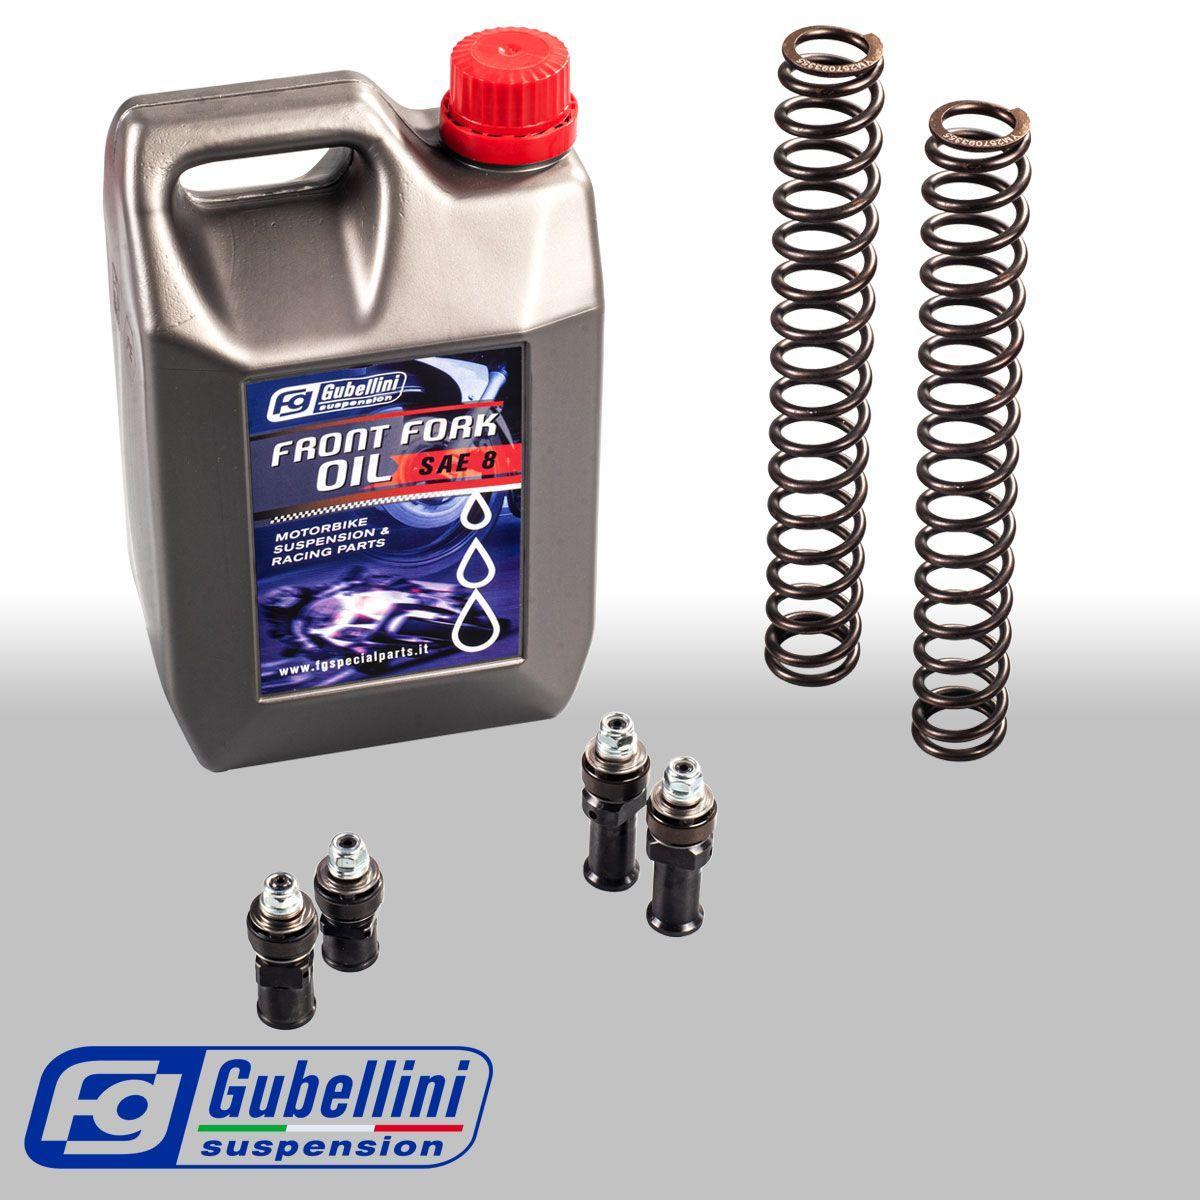 Hydraulic kit FGKF